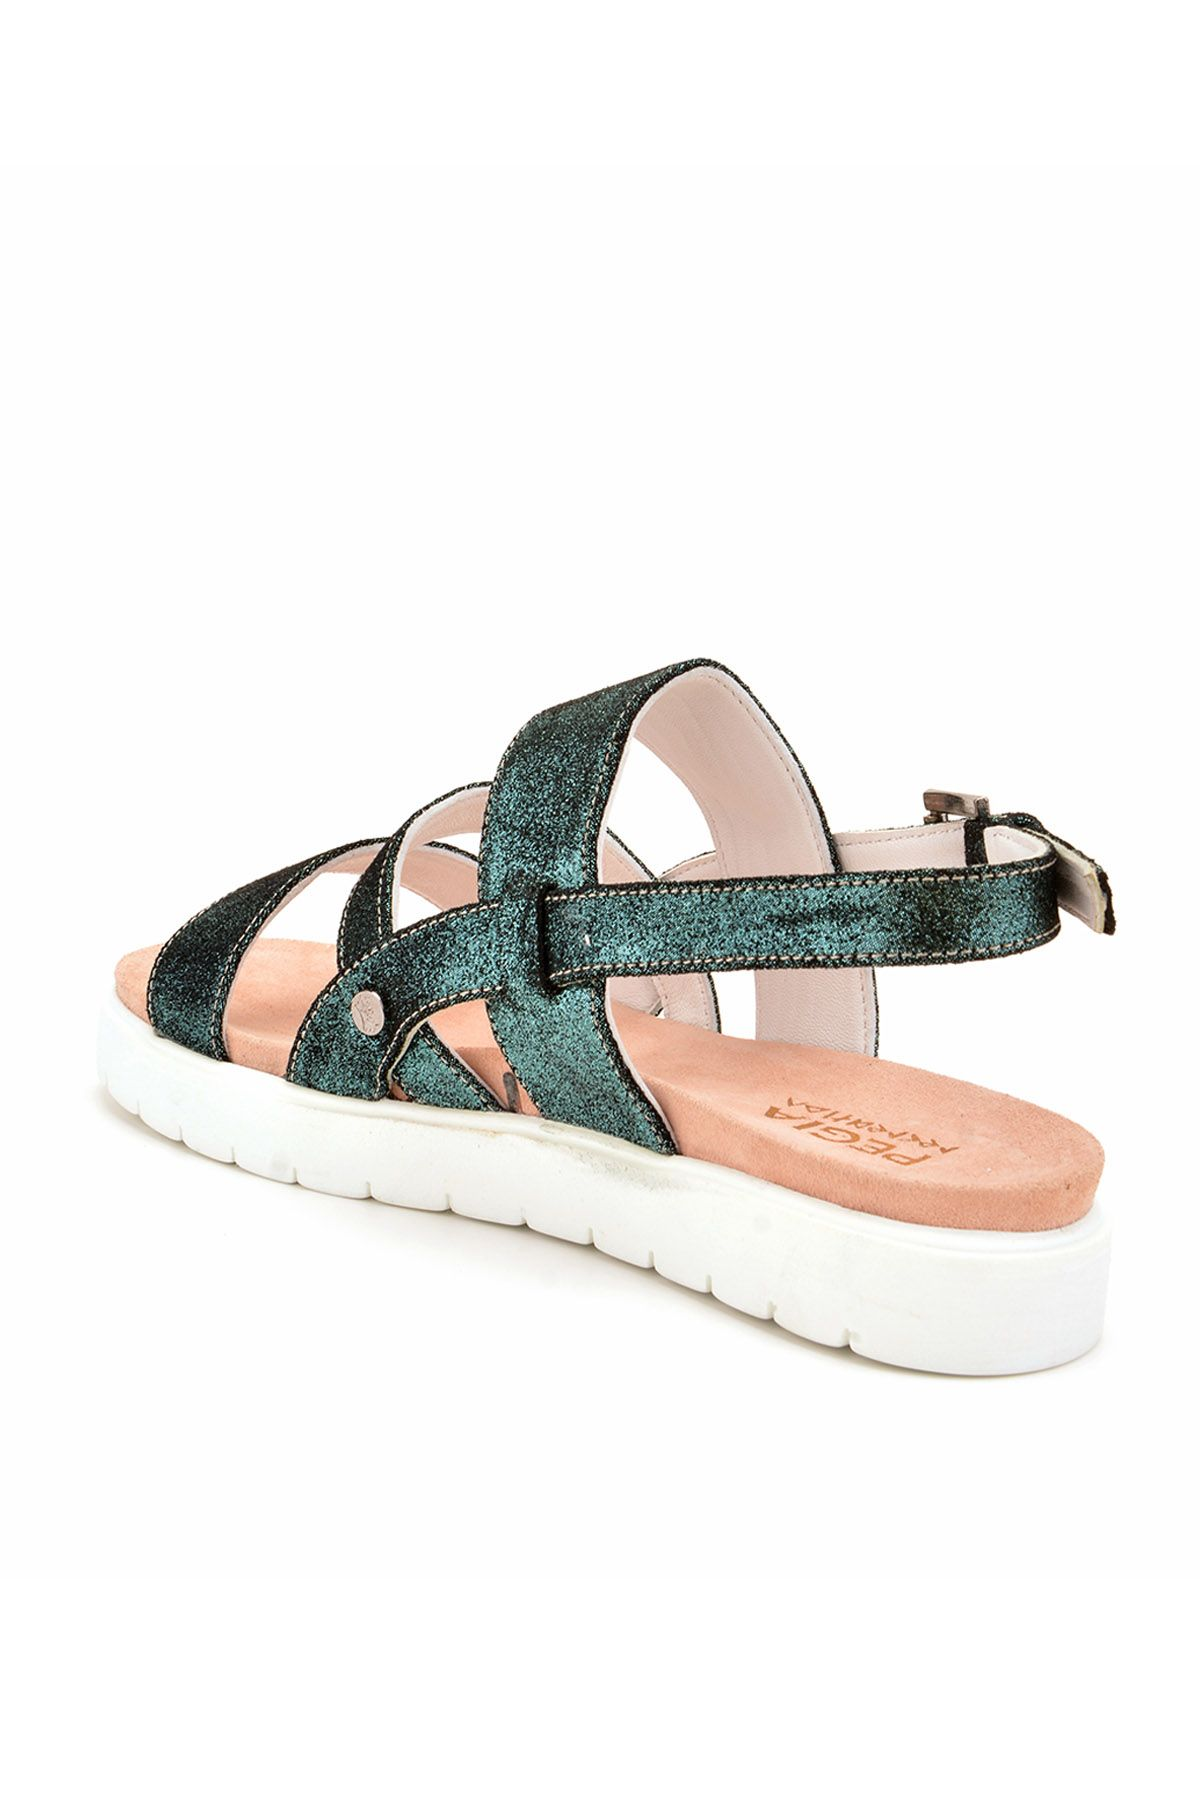 Pegia Gabrielle Hakiki Deri Bayan Sandalet REC-001 Зеленый